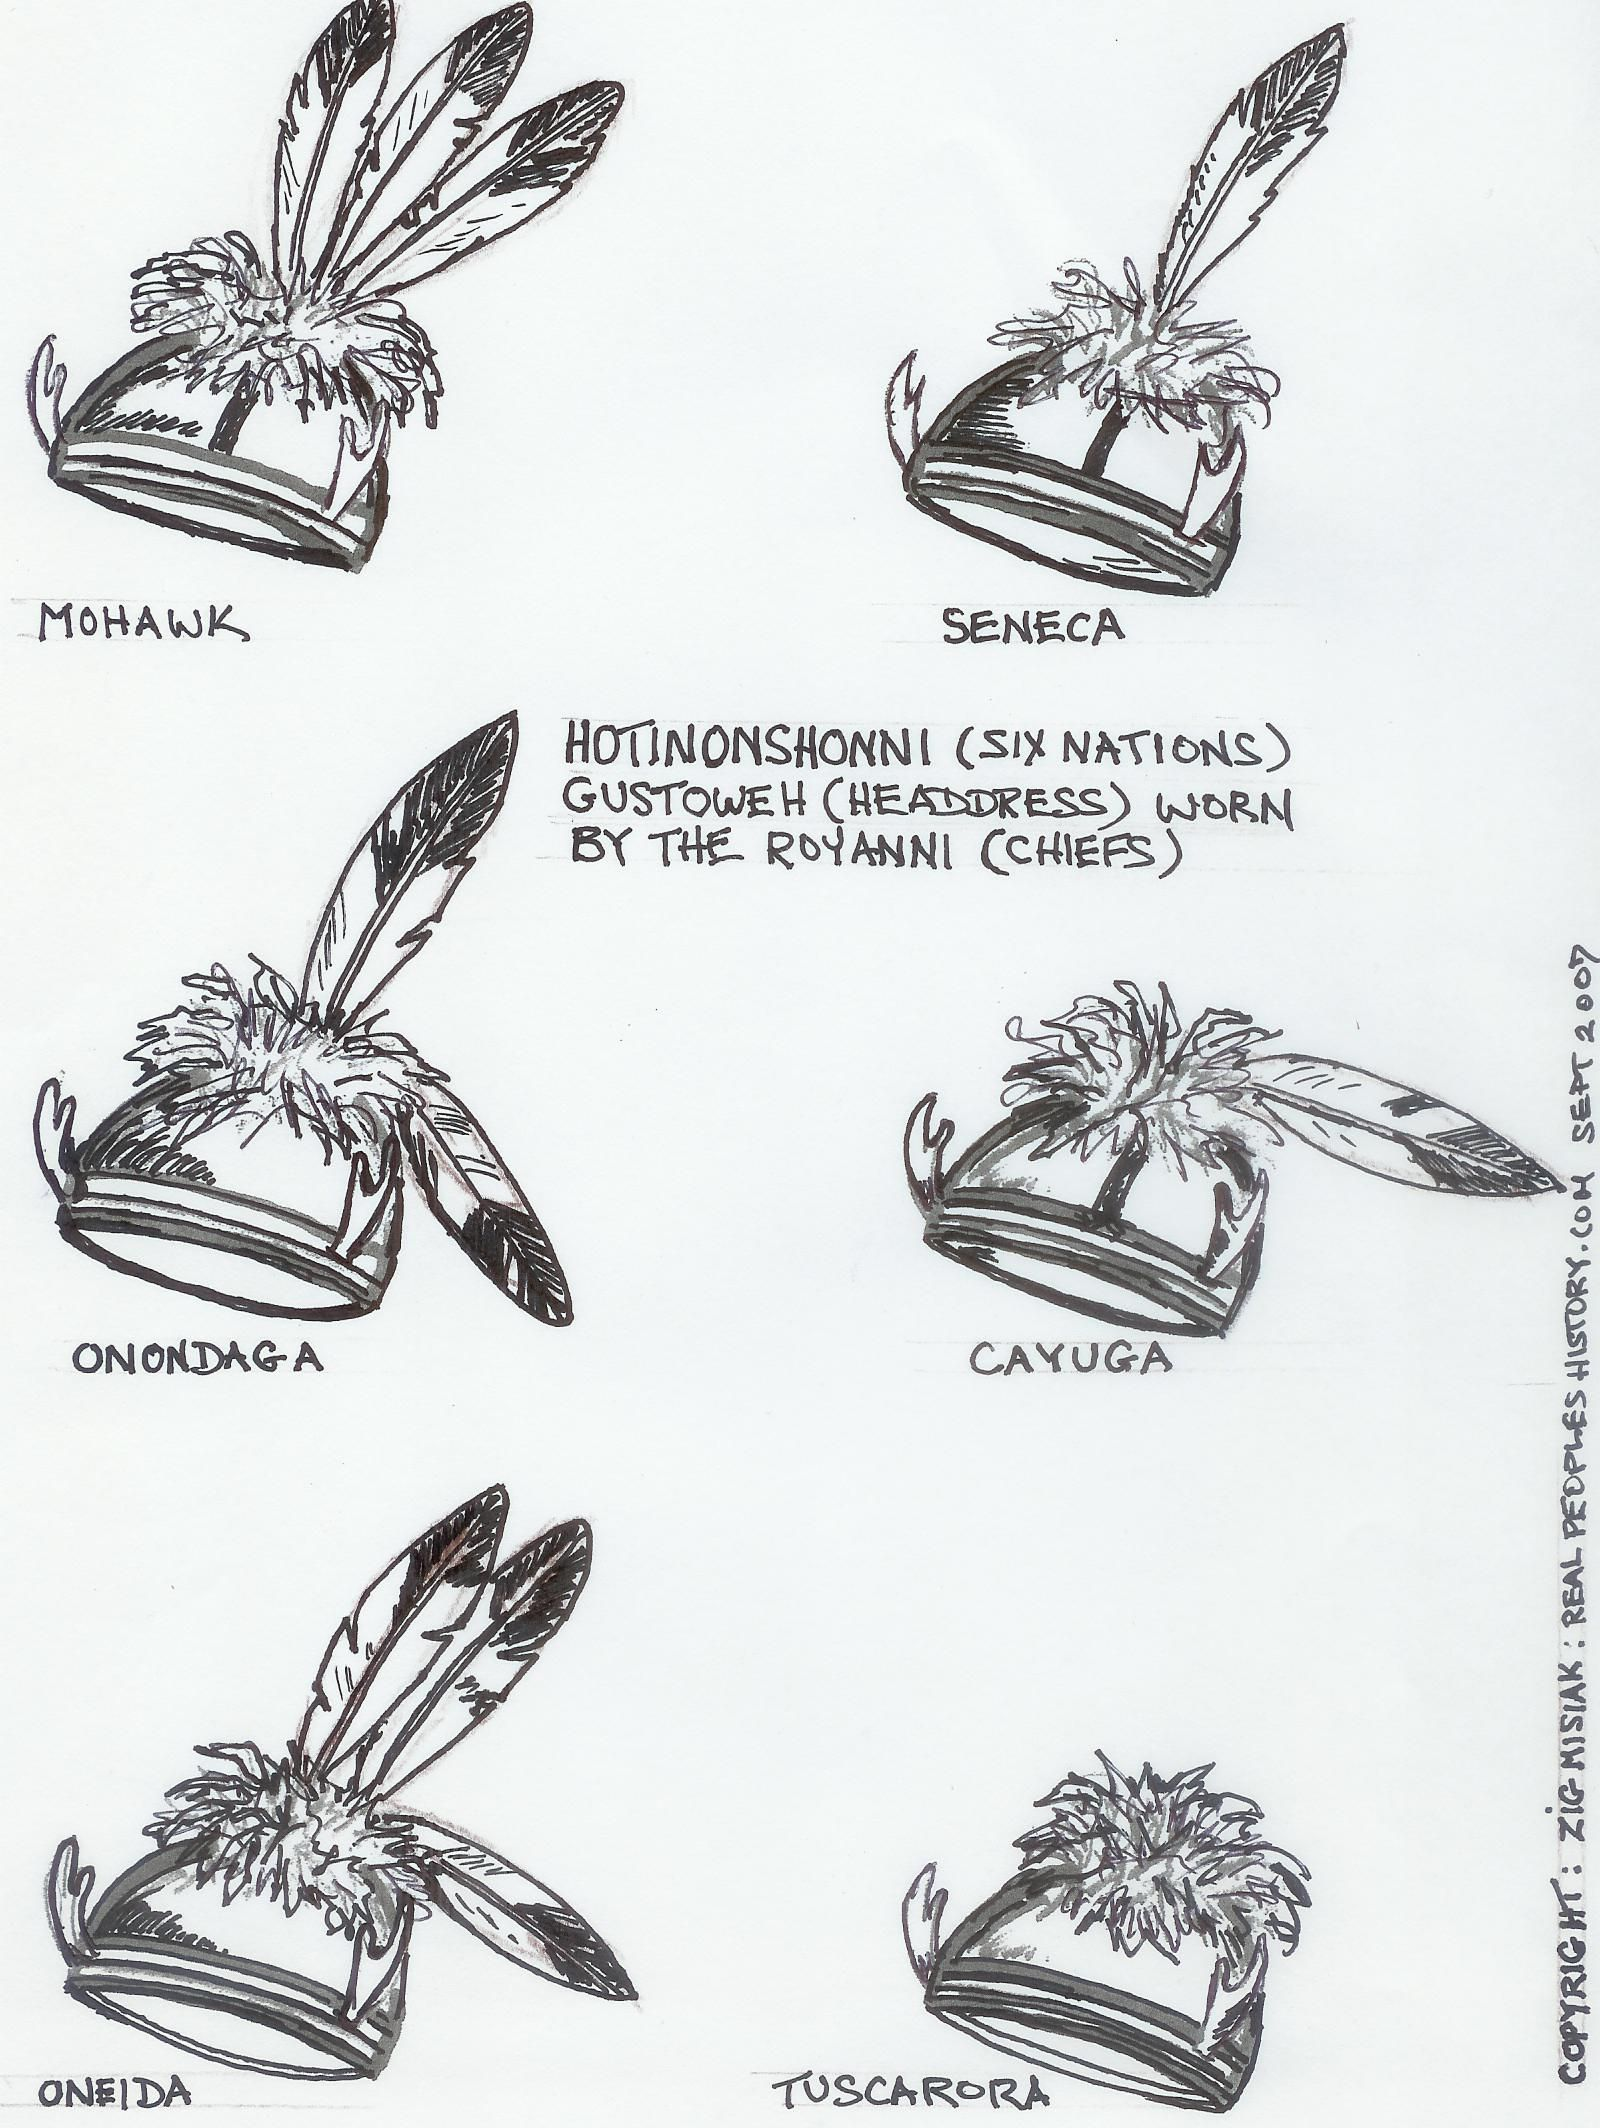 Pin On Haudenosaunee Iroquois Confederacy Culture